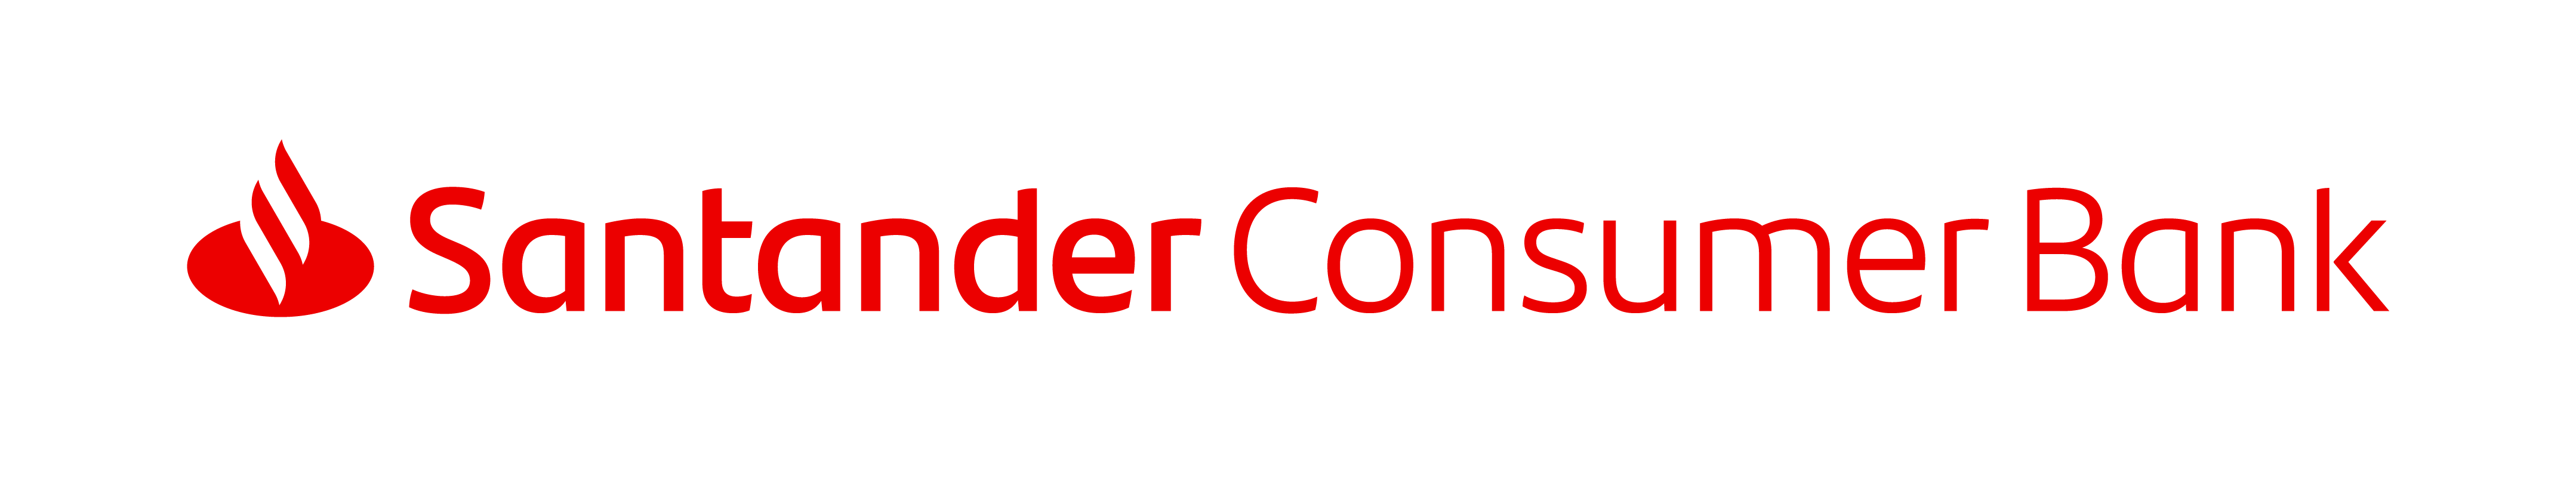 santander finanzierung logo